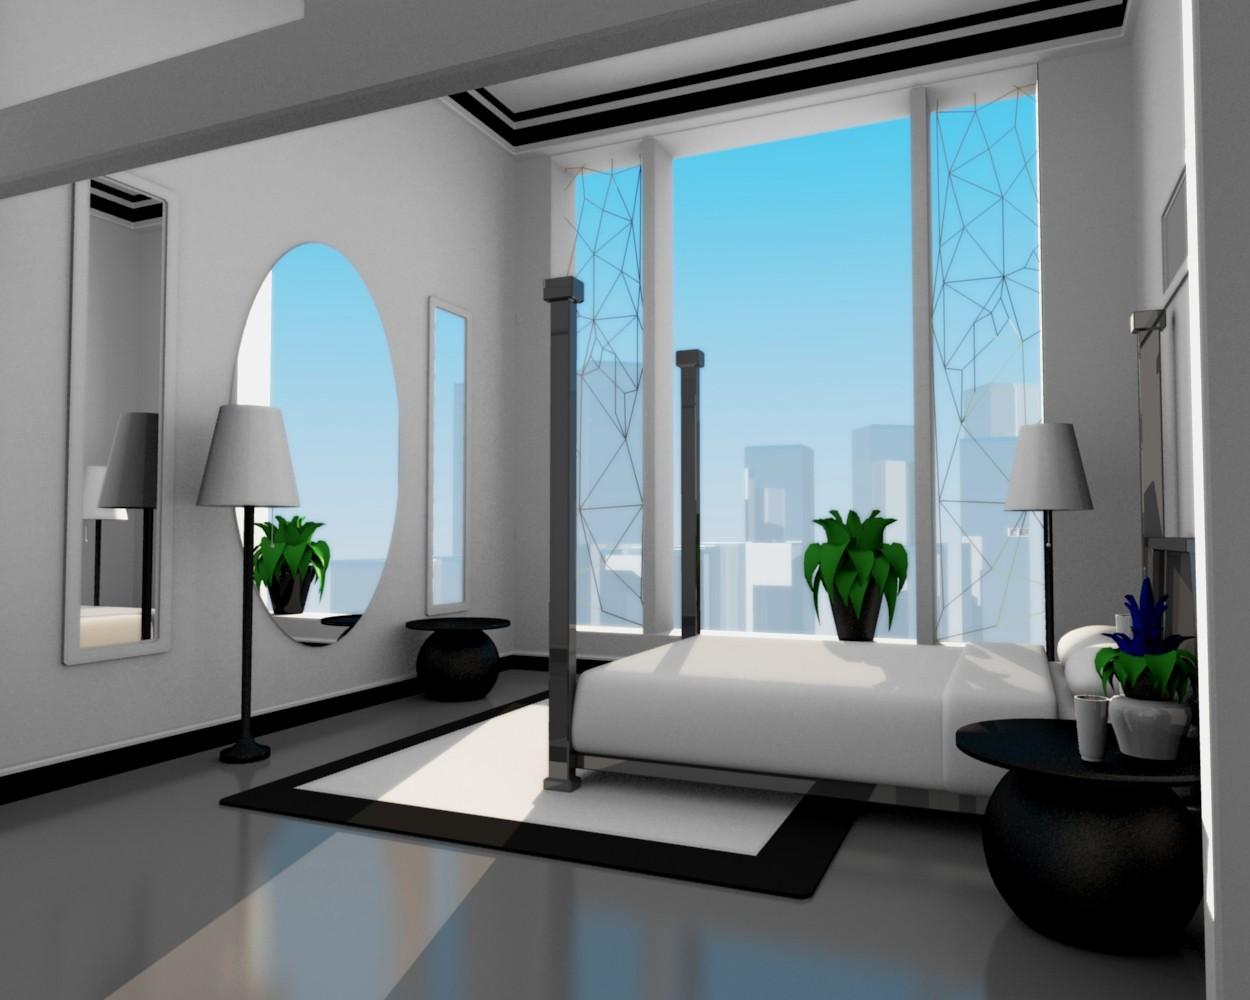 """Dream Apartment"" Bedroom 1 by flowermuncher on DeviantArt"